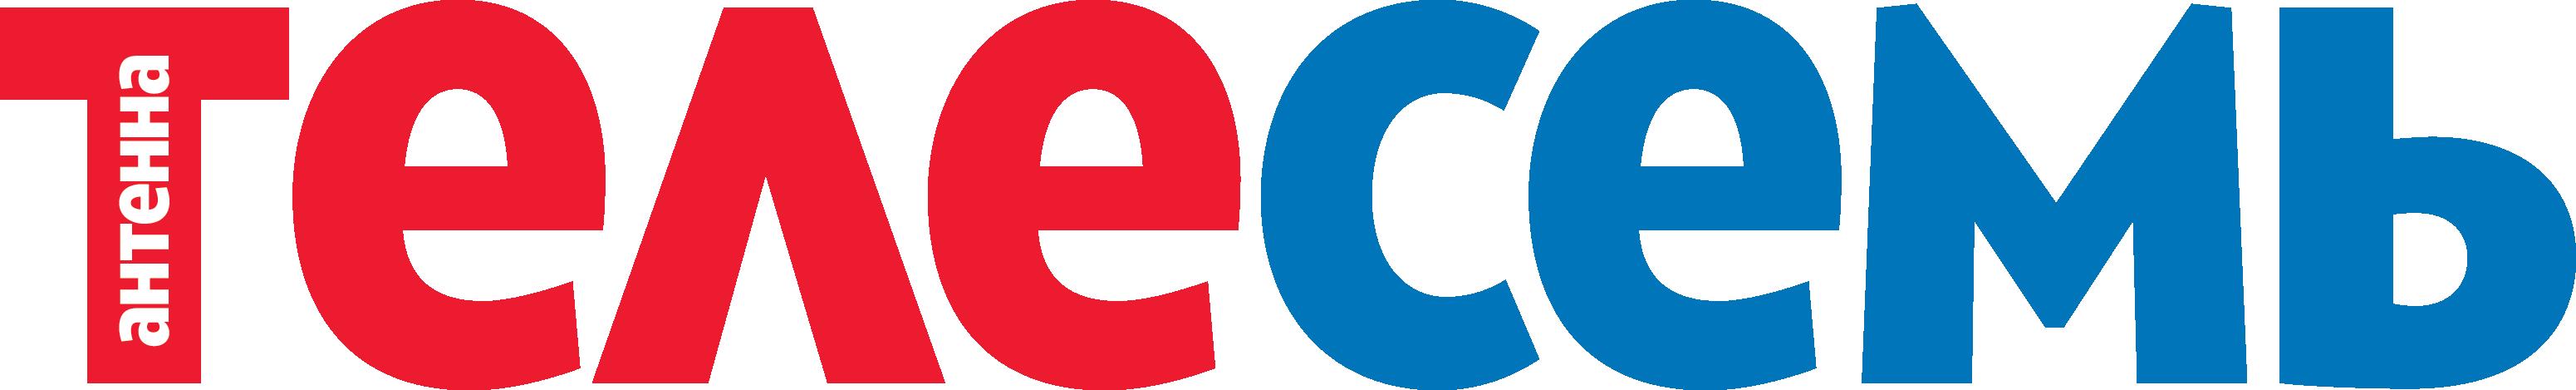 AT7-logo-Телесемь